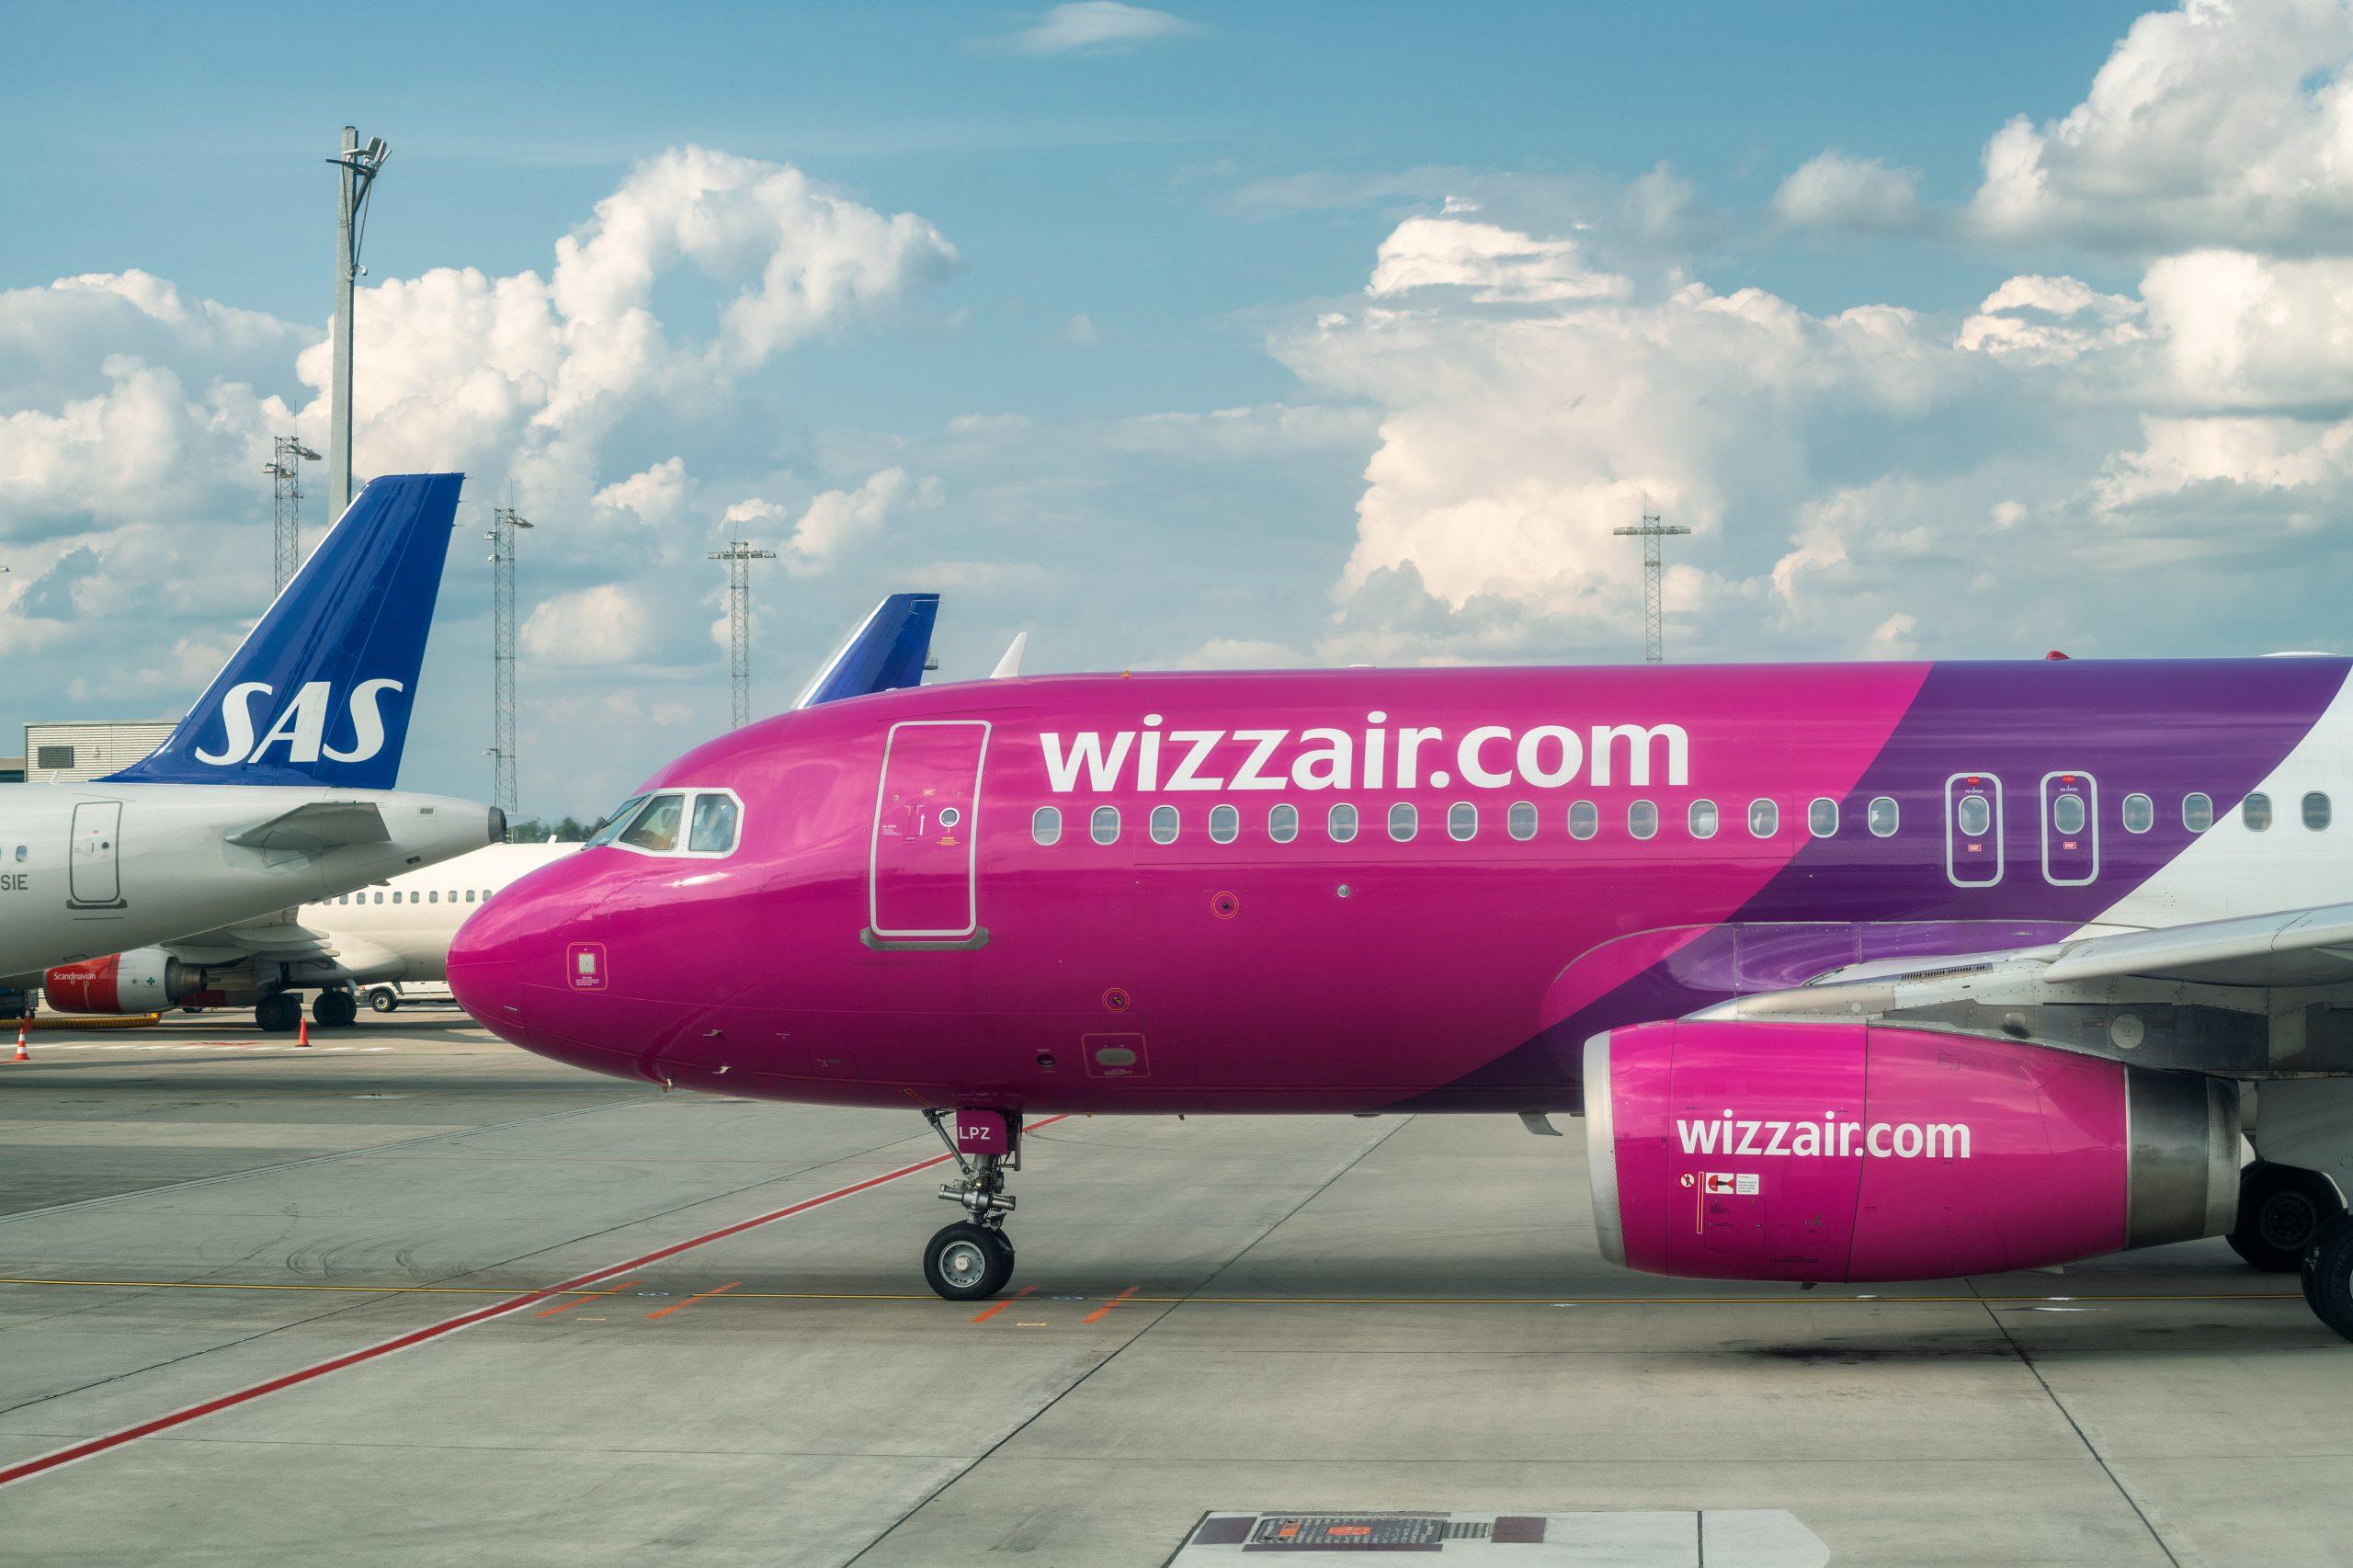 Fly fra Wizz Air i Oslo Lufthavn. (Foto: GagliardiPhotography)